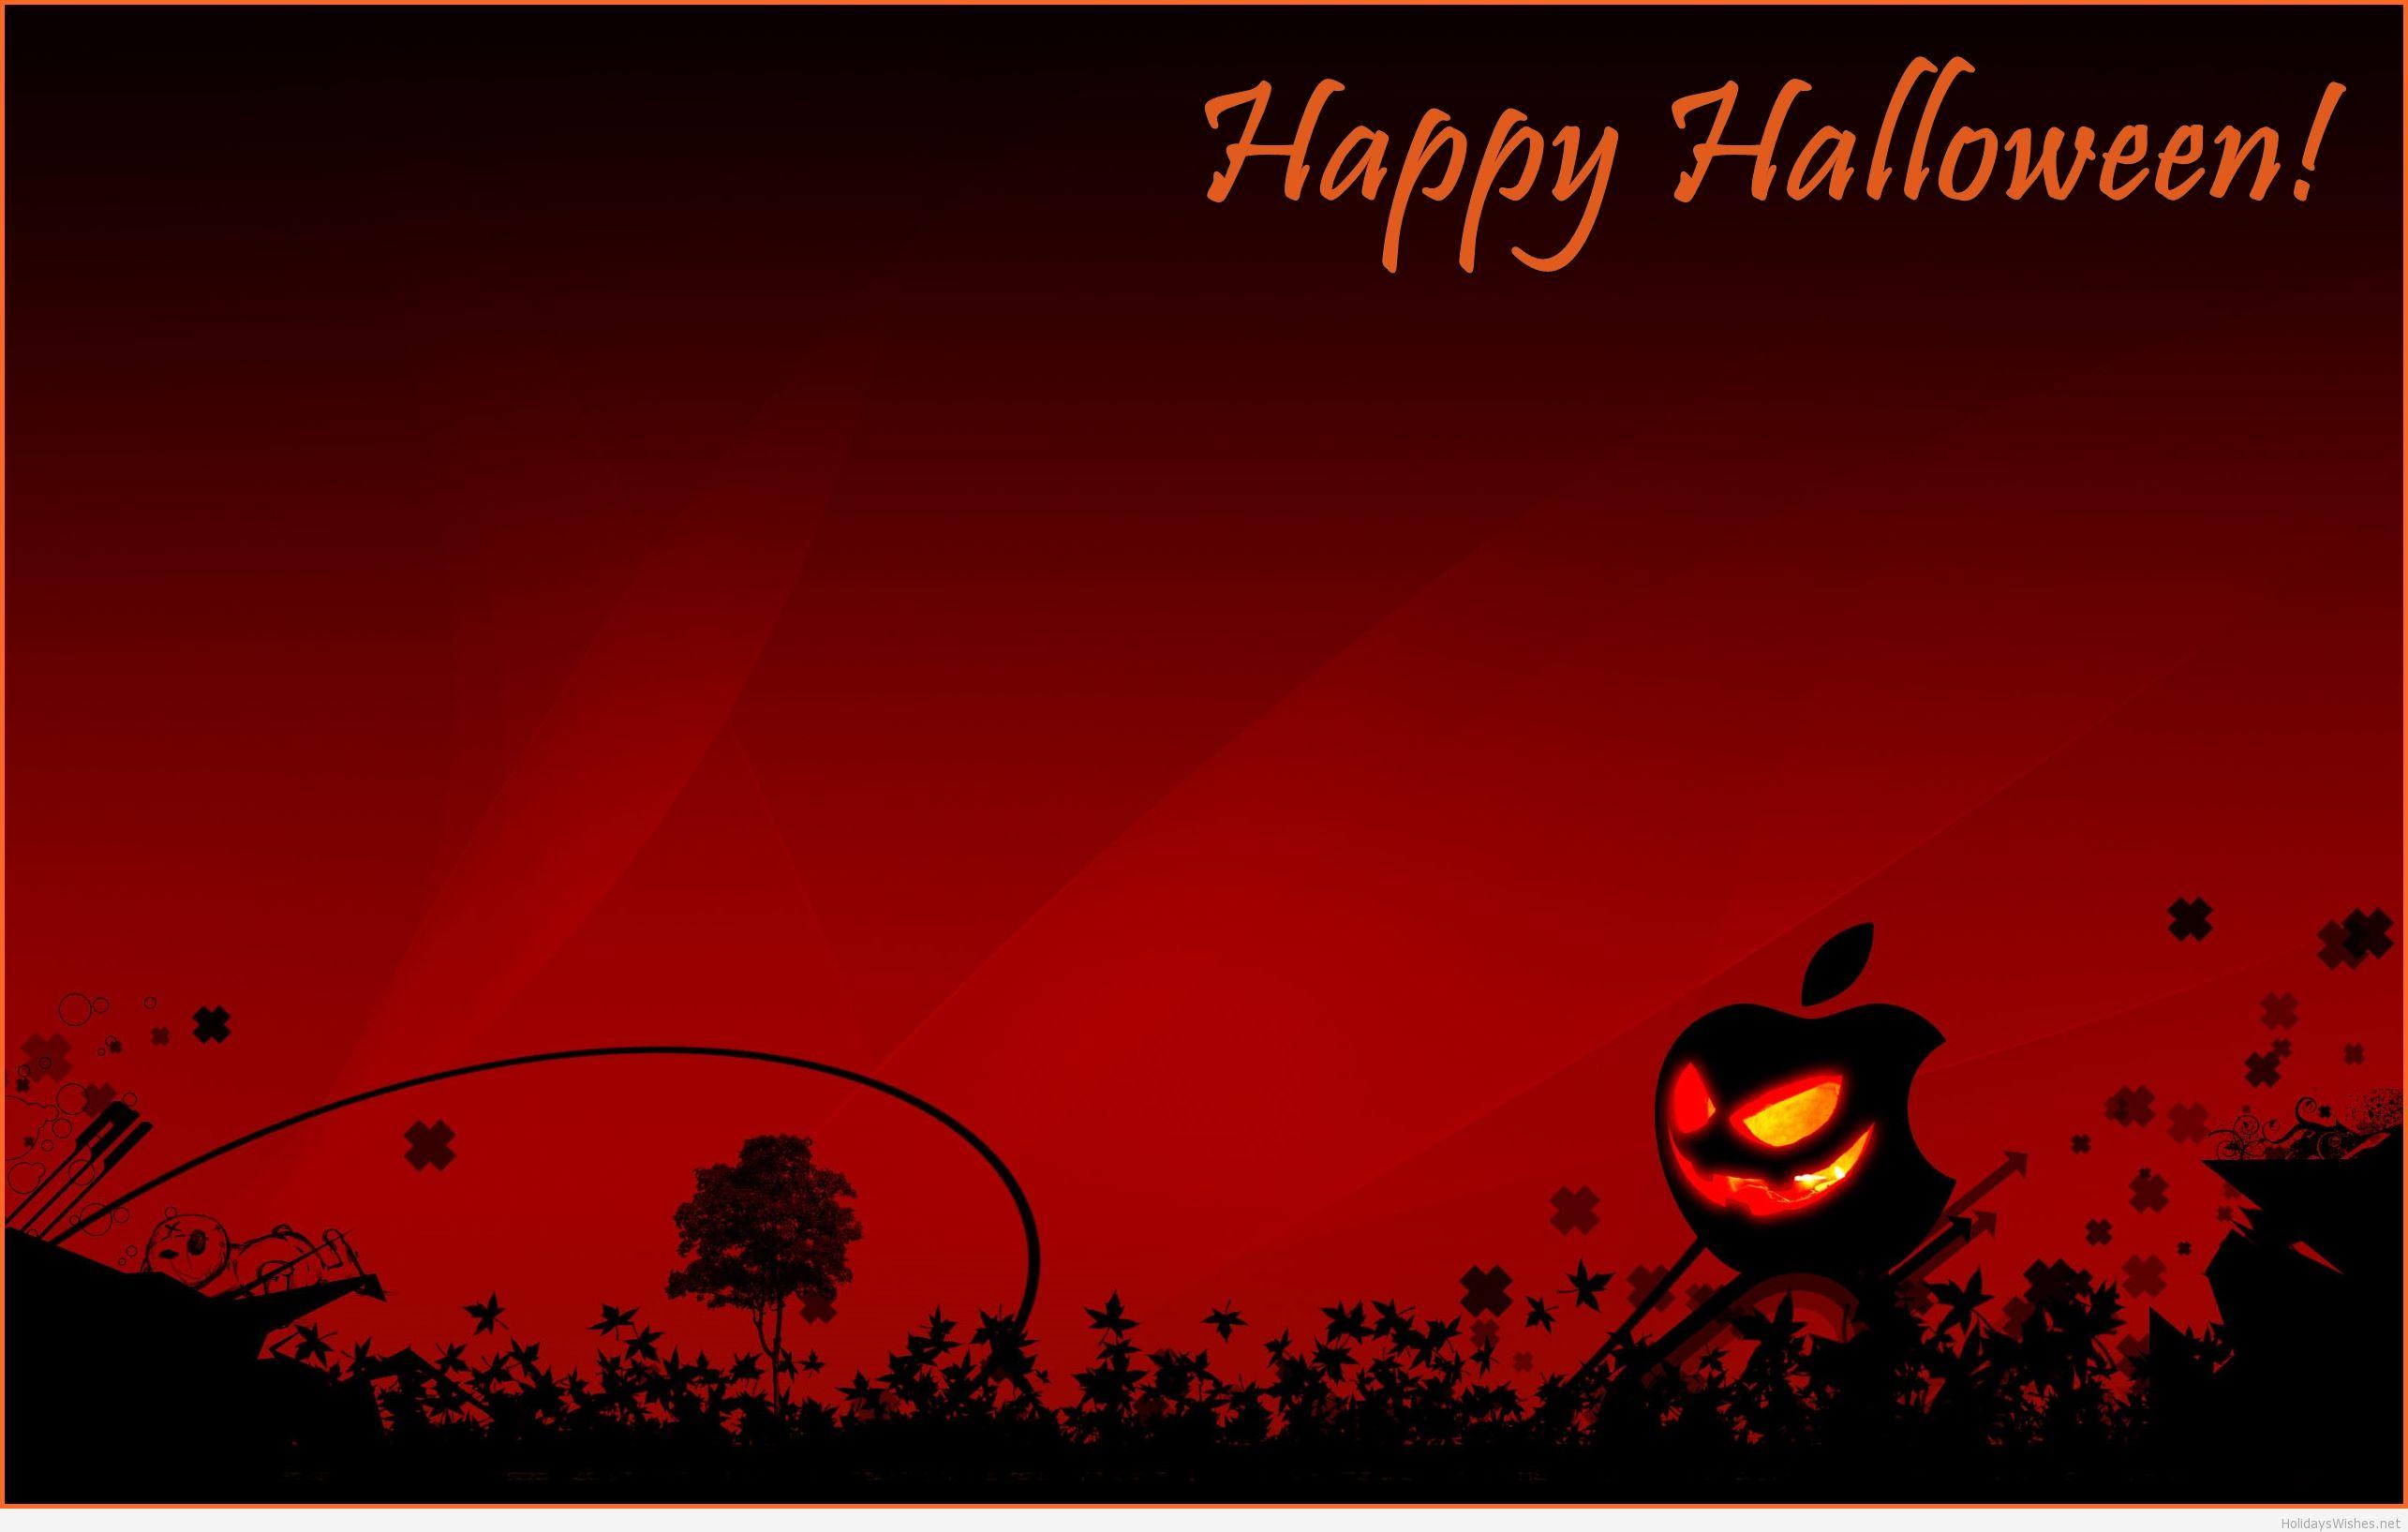 Happy-Halloween-scary